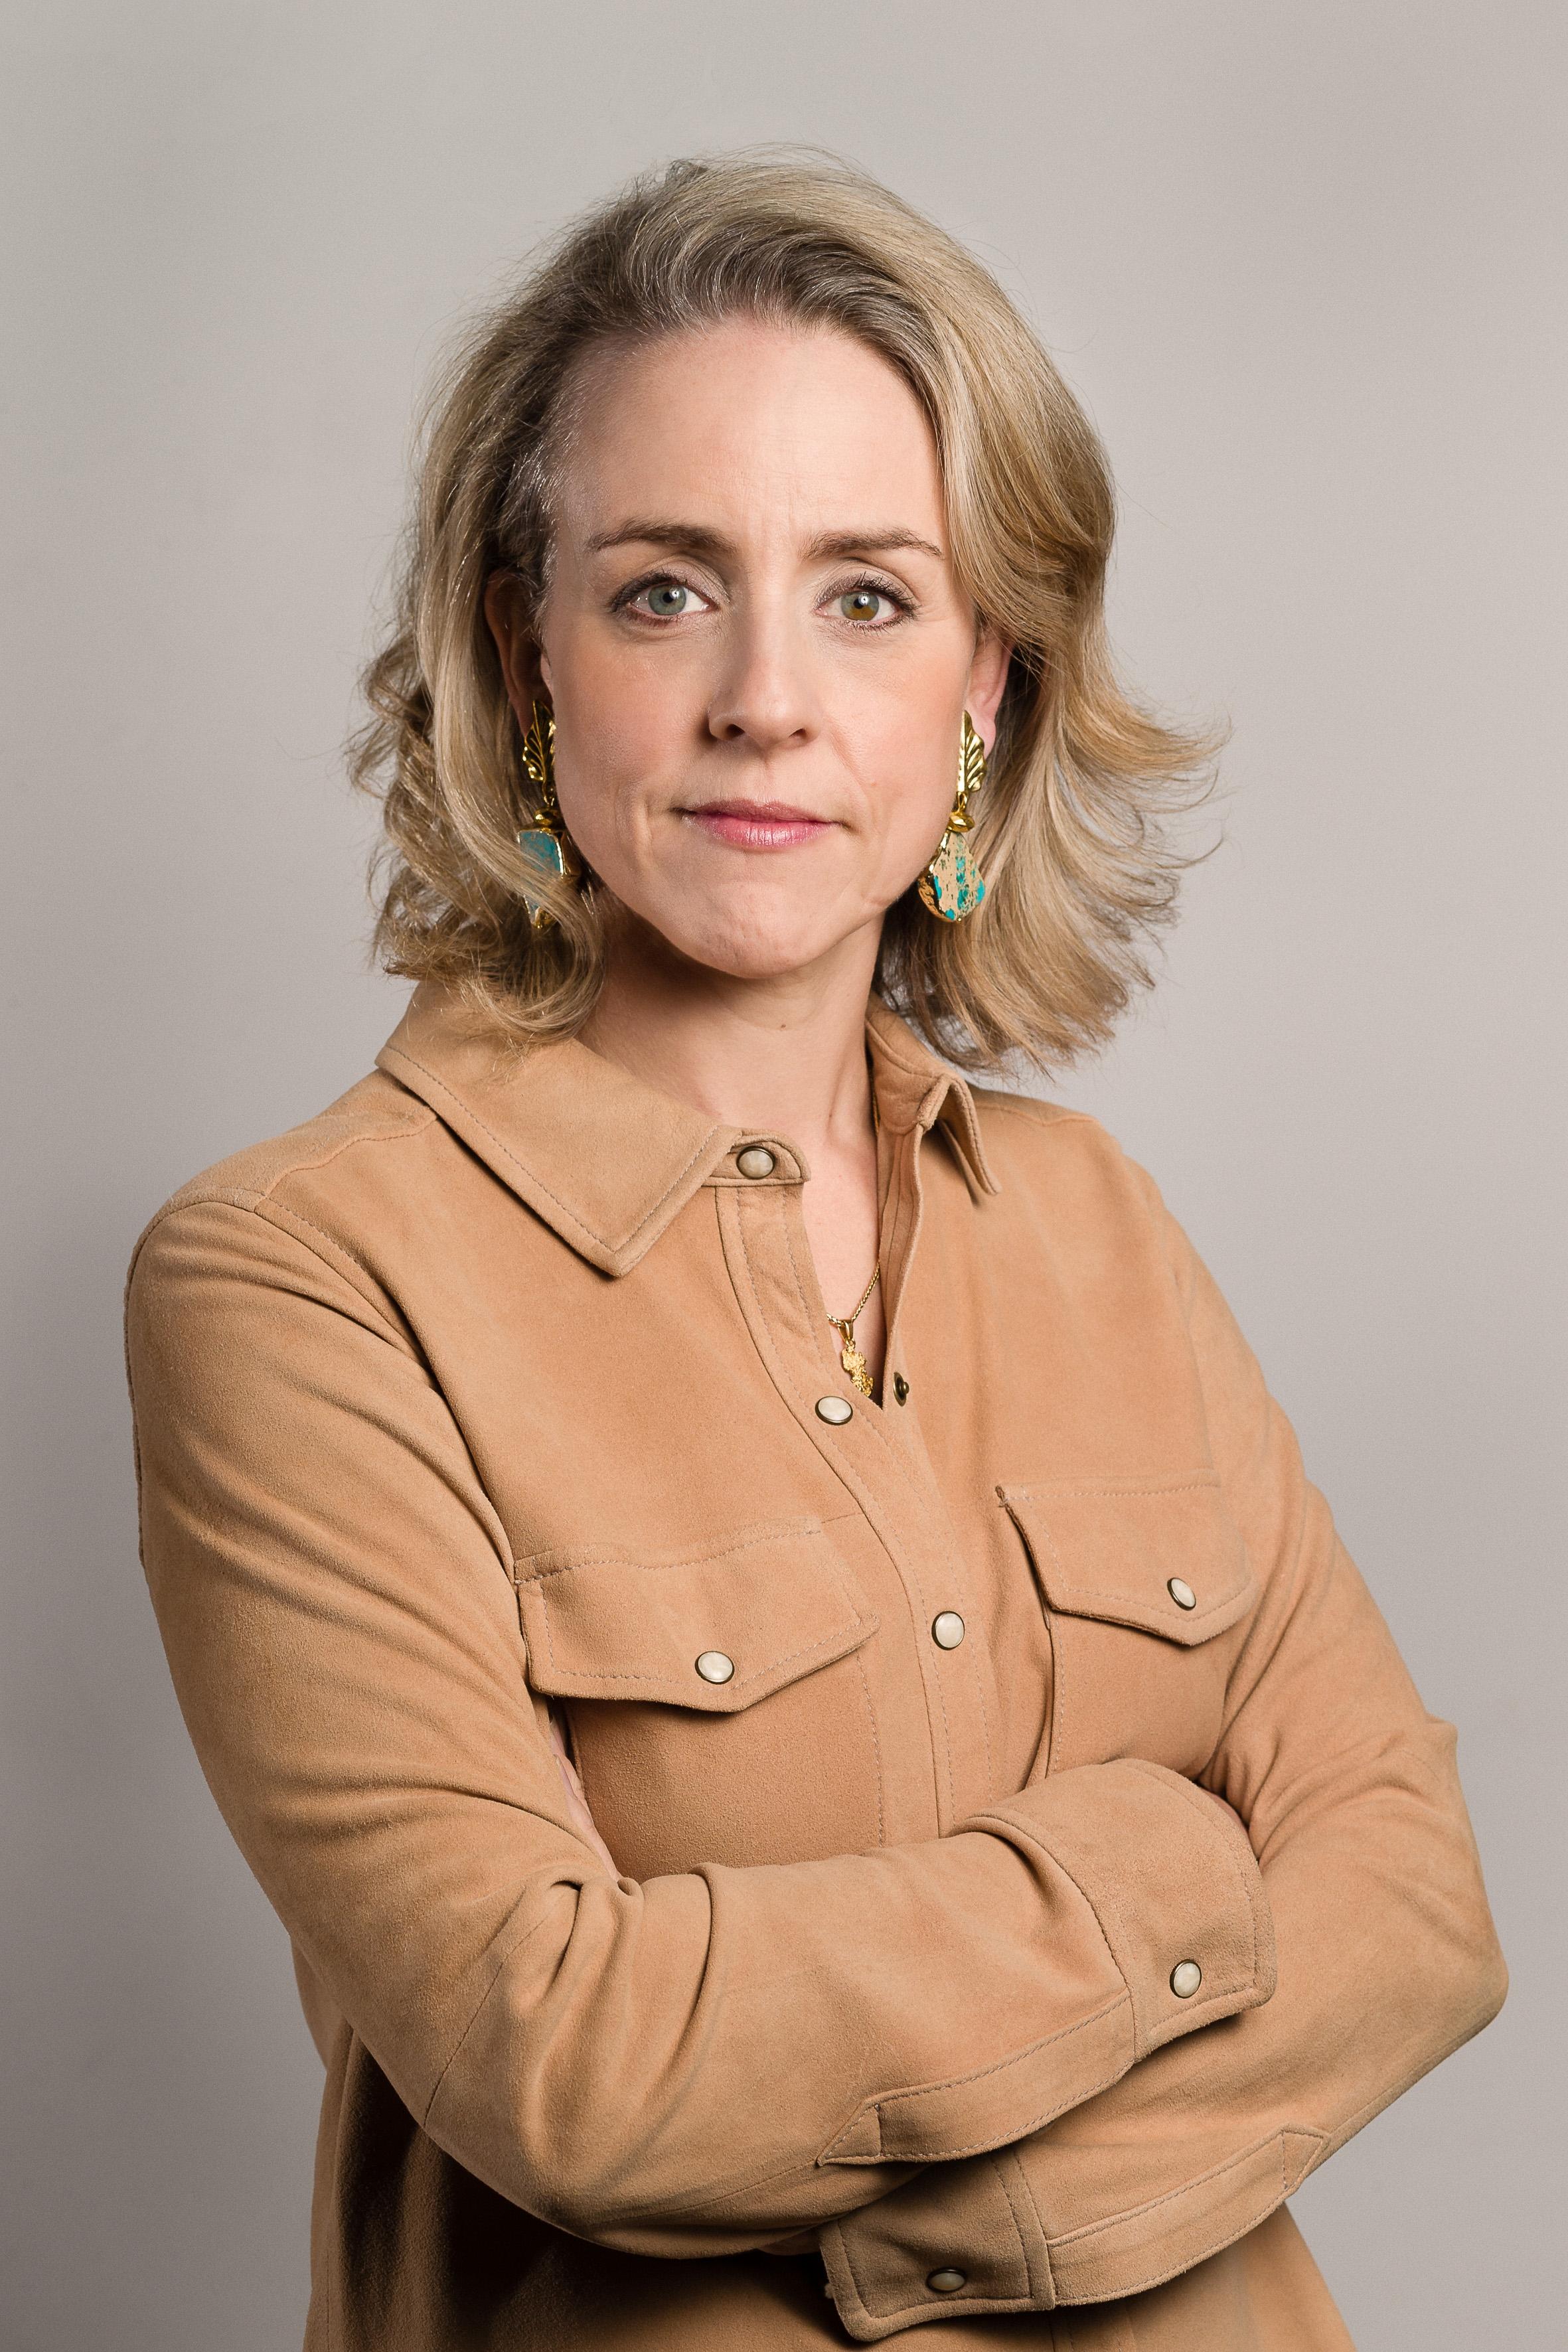 Nicola Green